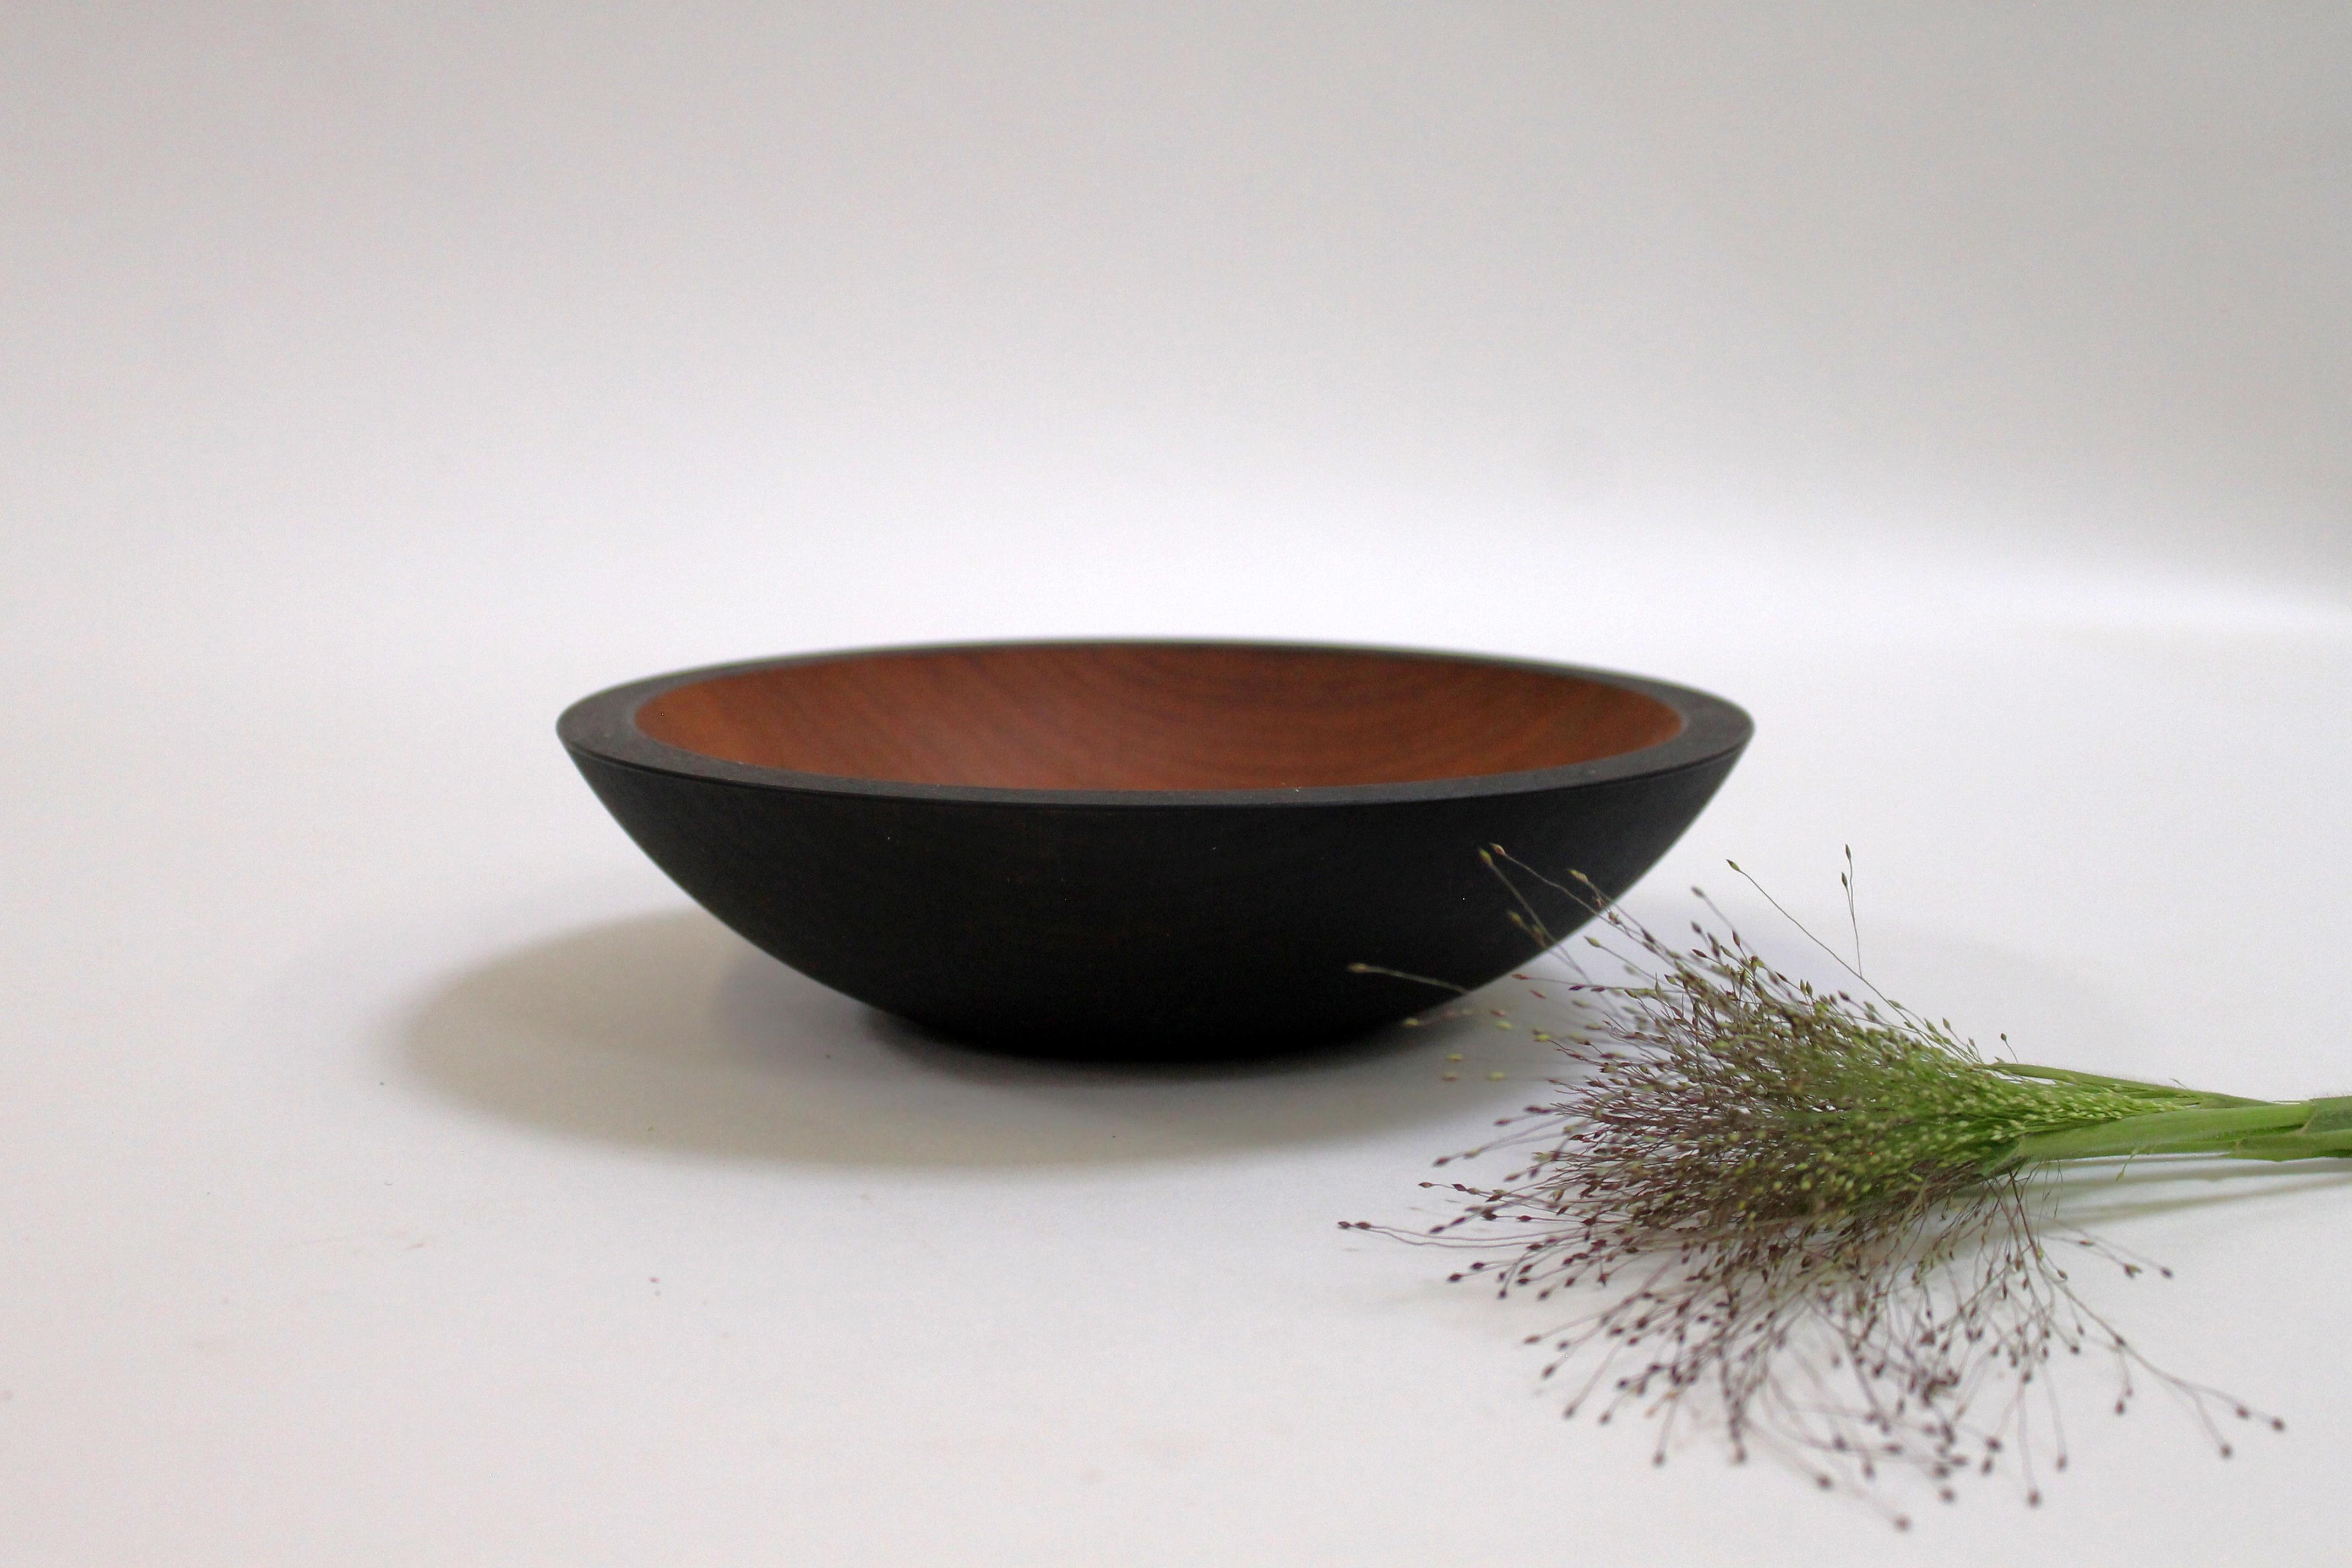 9 inch Ebonized Cherry Bowl - Bee's Oil Finish EC109B